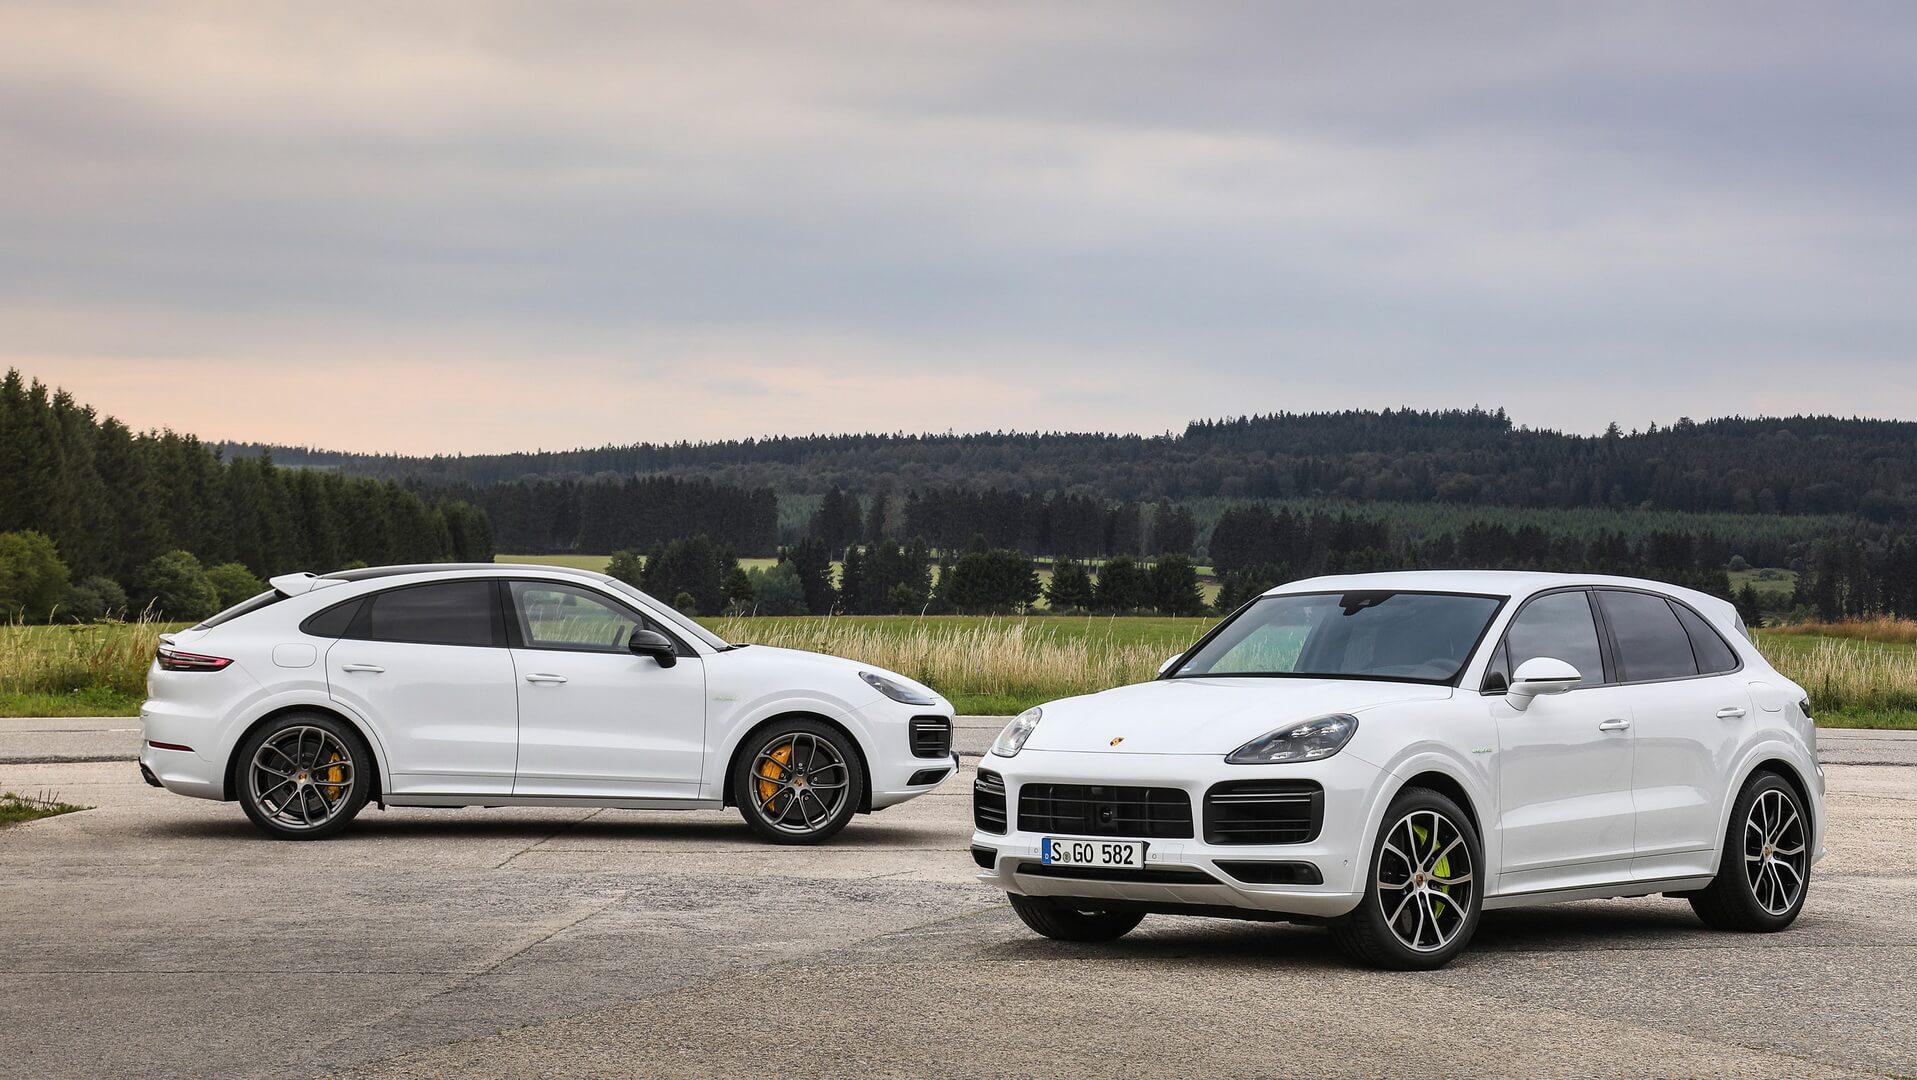 Плагин-гибриды Porsche Cayenne Turbo S E-Hybrid Coupé и Cayenne Turbo S E-Hybrid